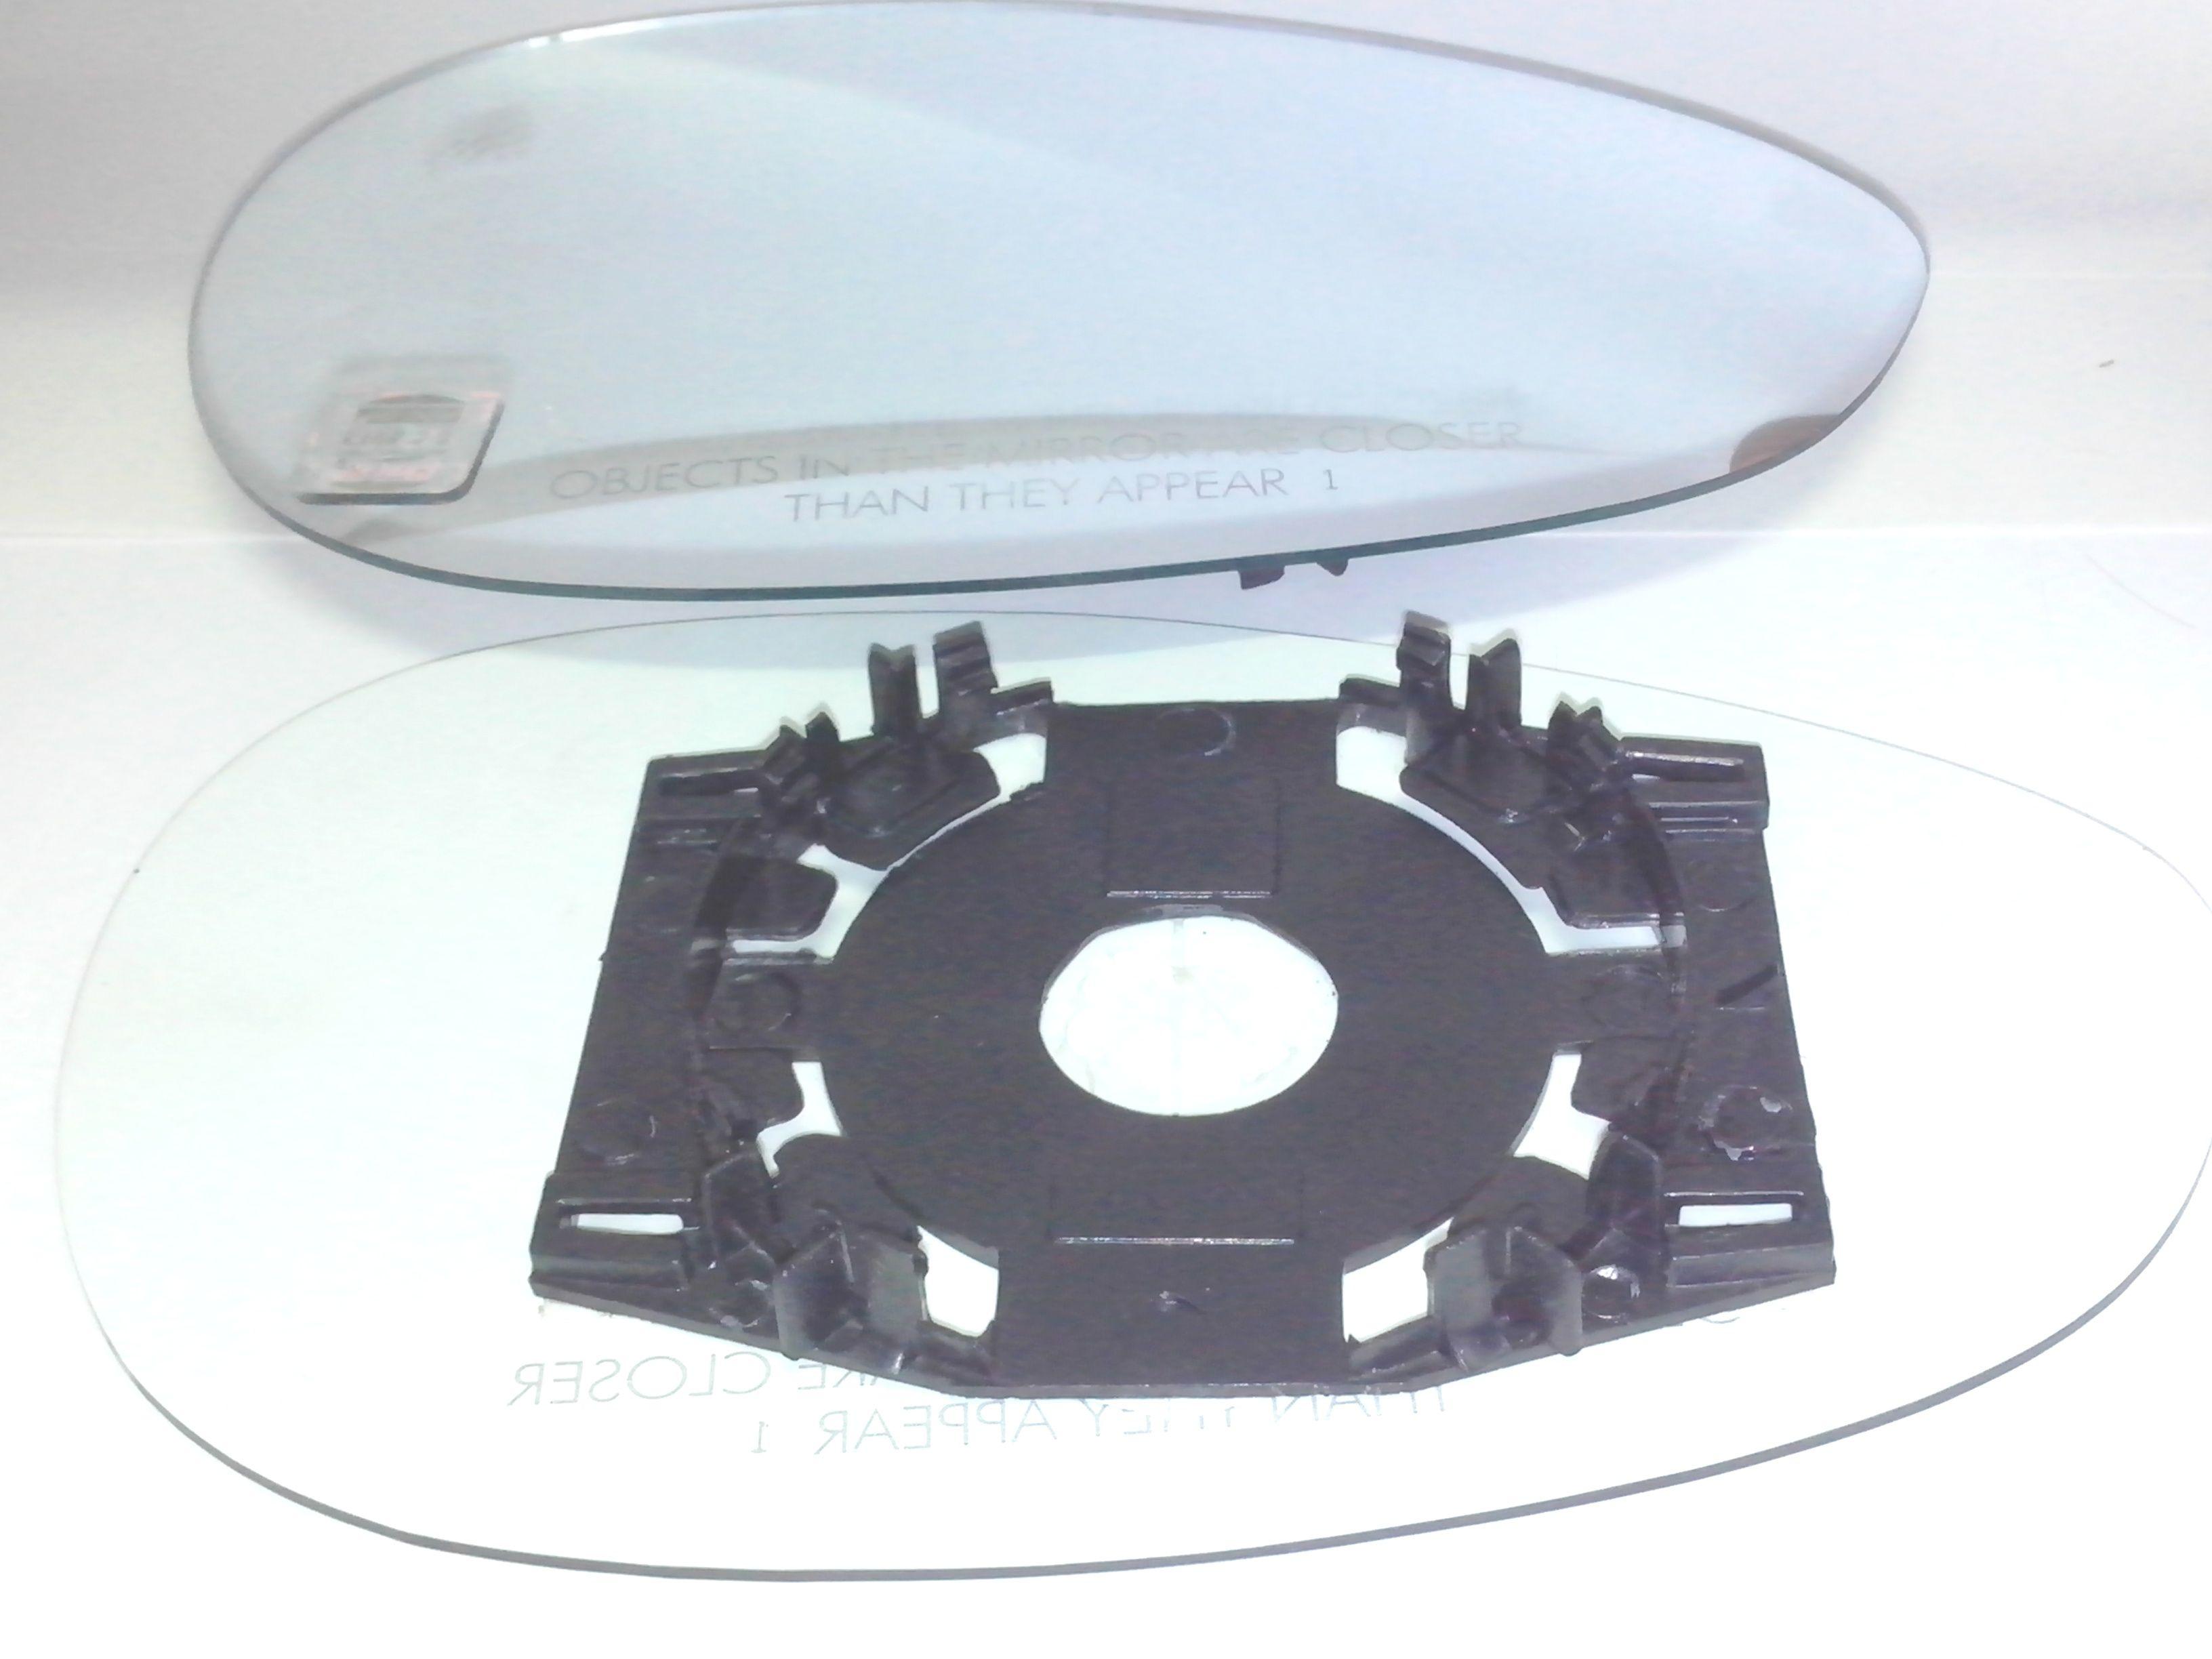 MANTRA-CONVEX MIRROR PLATES (SUB MIRROR PLATES) FOR FIAT LINEA LEFT SIDE